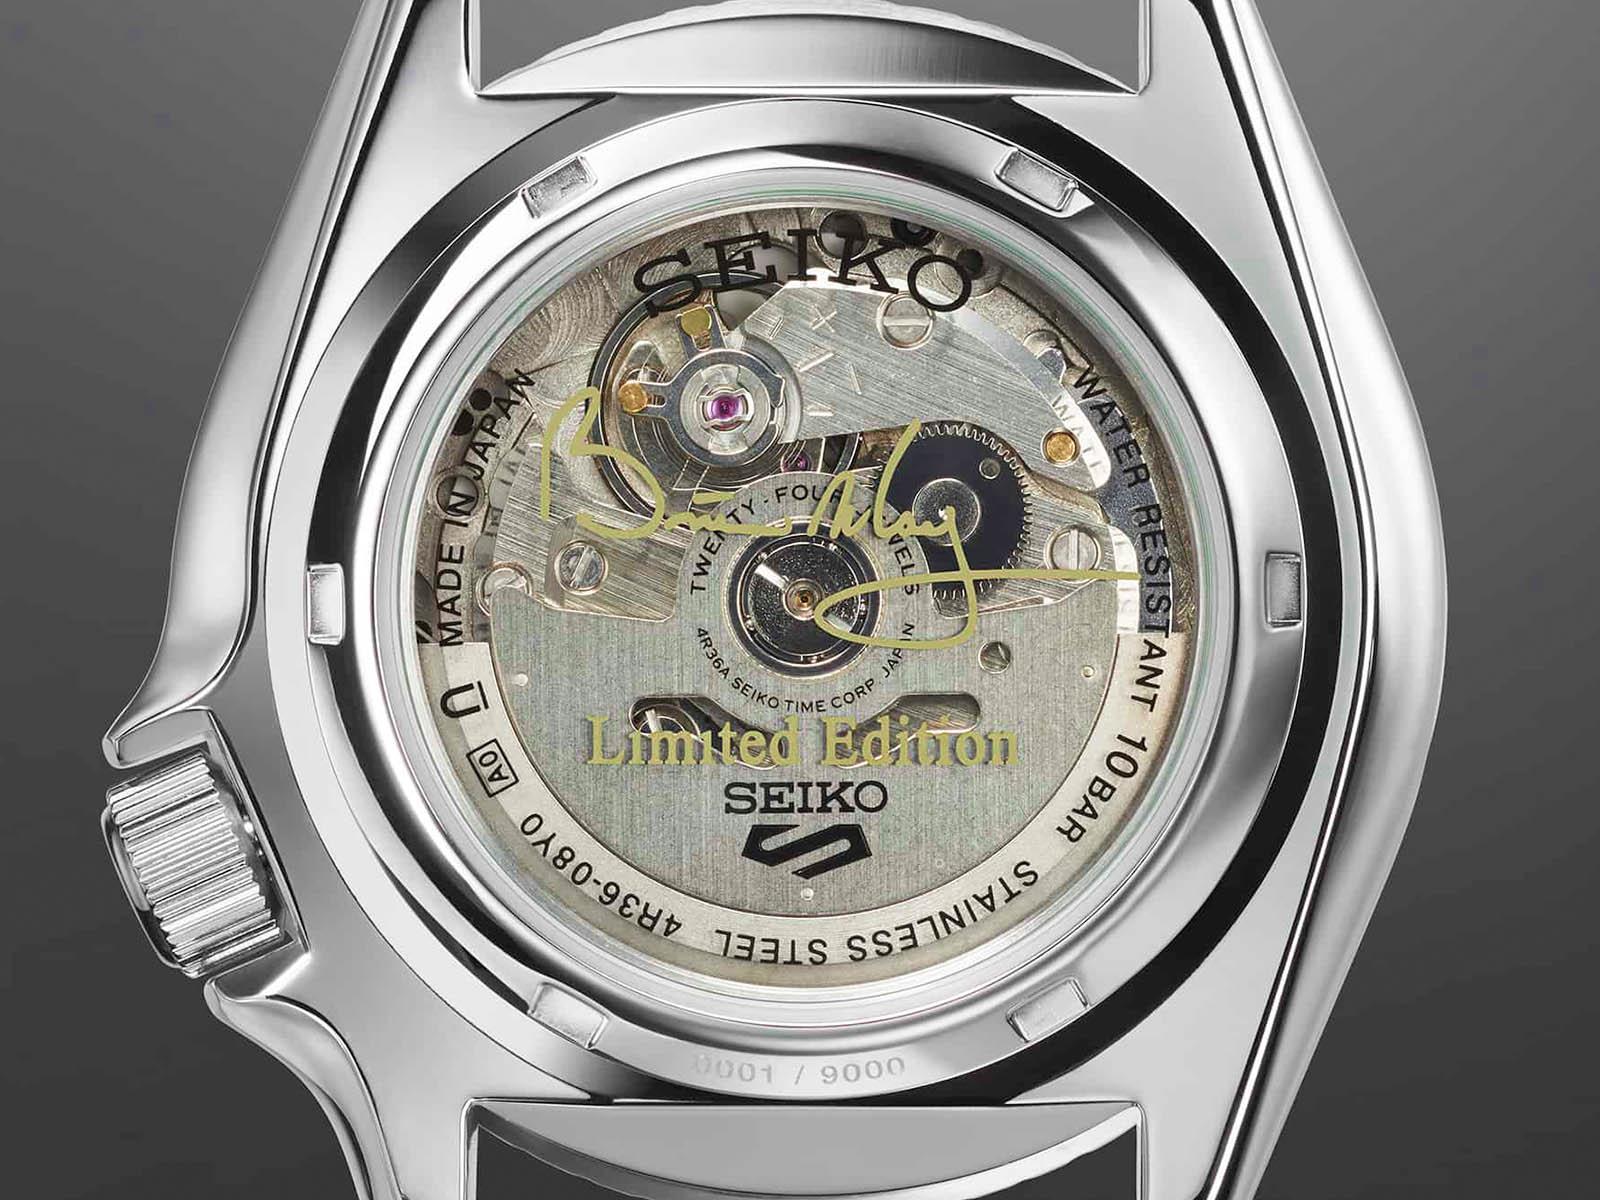 srpe83k1-seiko-5-sports-brian-may-limited-edition-7.jpg